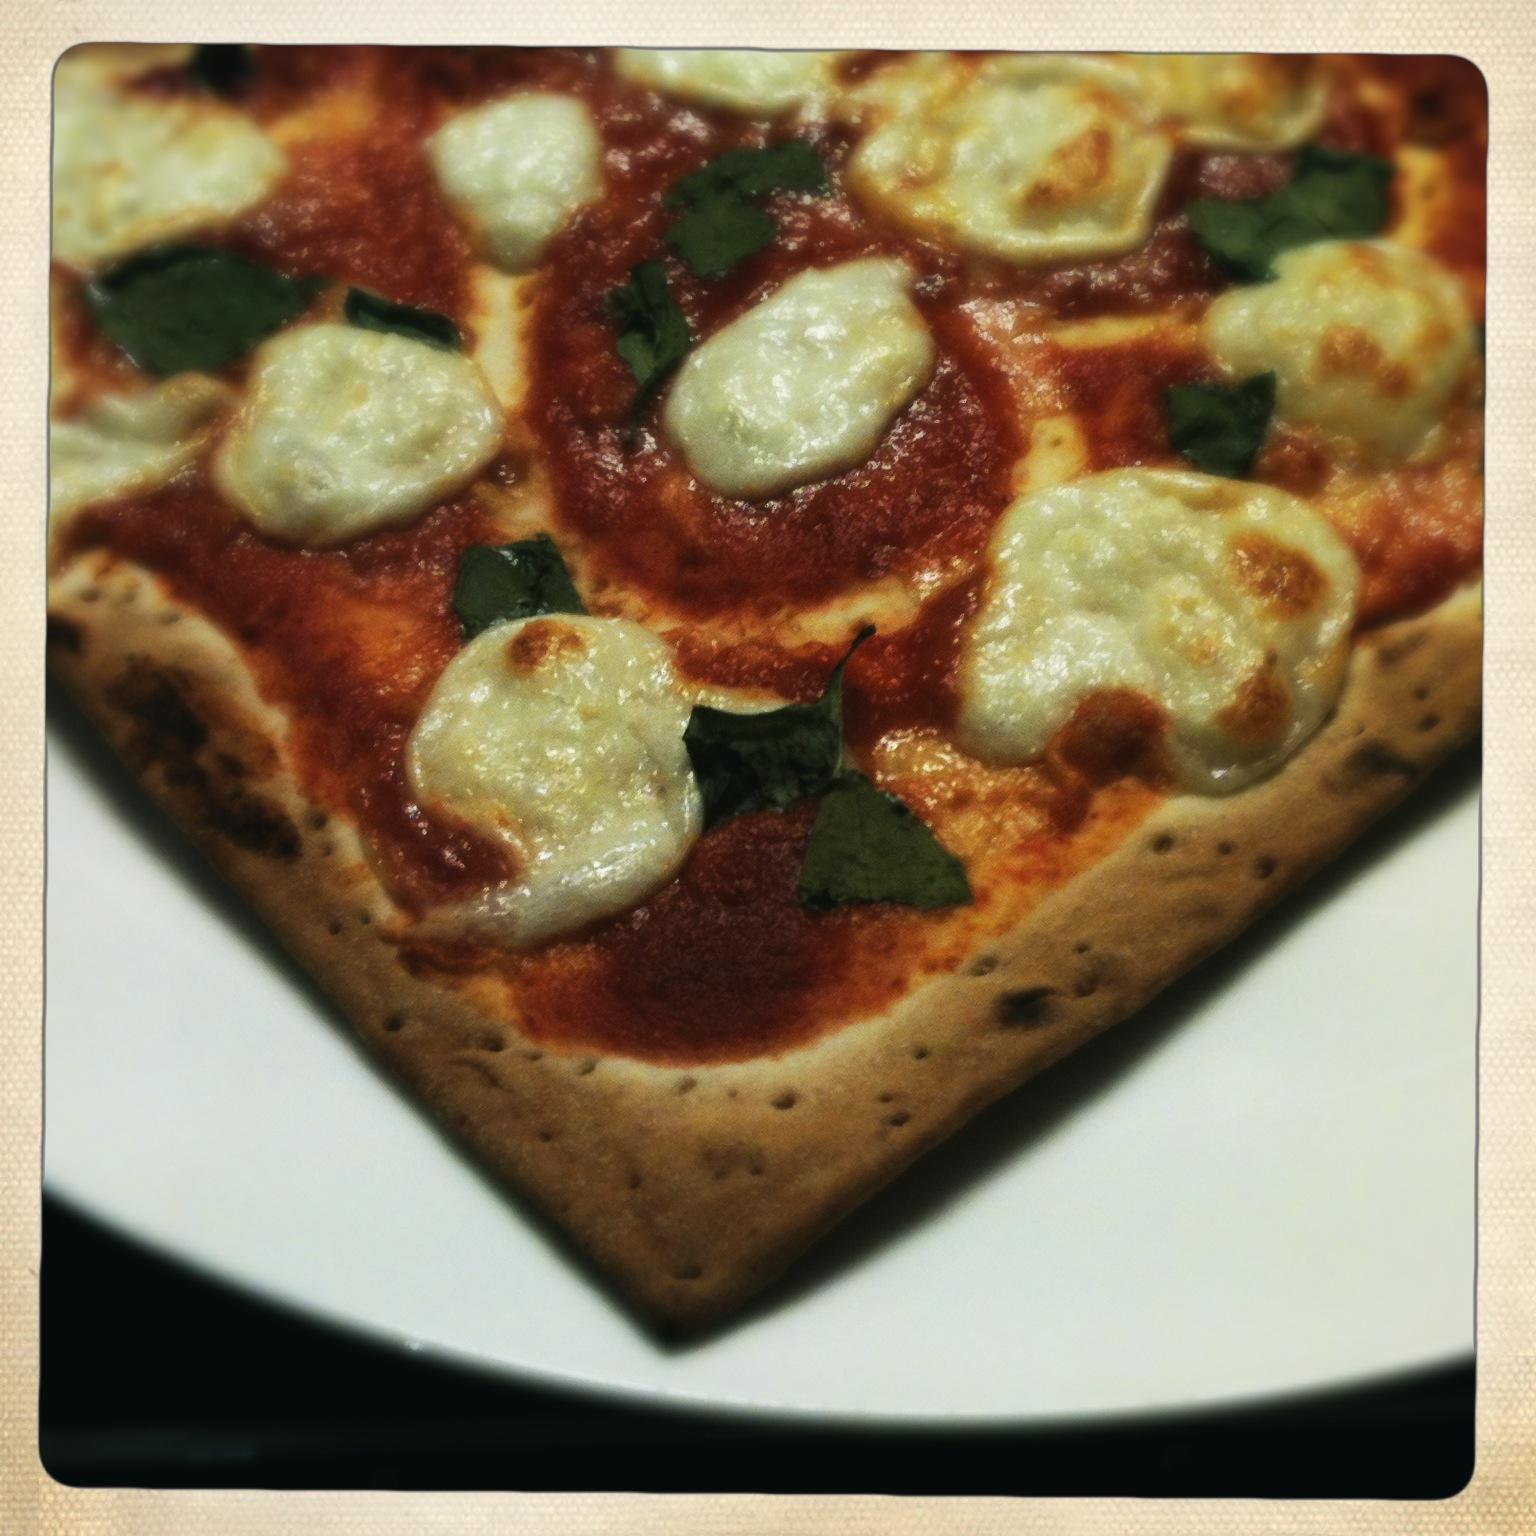 Slim Your Slice: Healthy Pizza Recipes Slim Your Slice: Healthy Pizza Recipes new picture